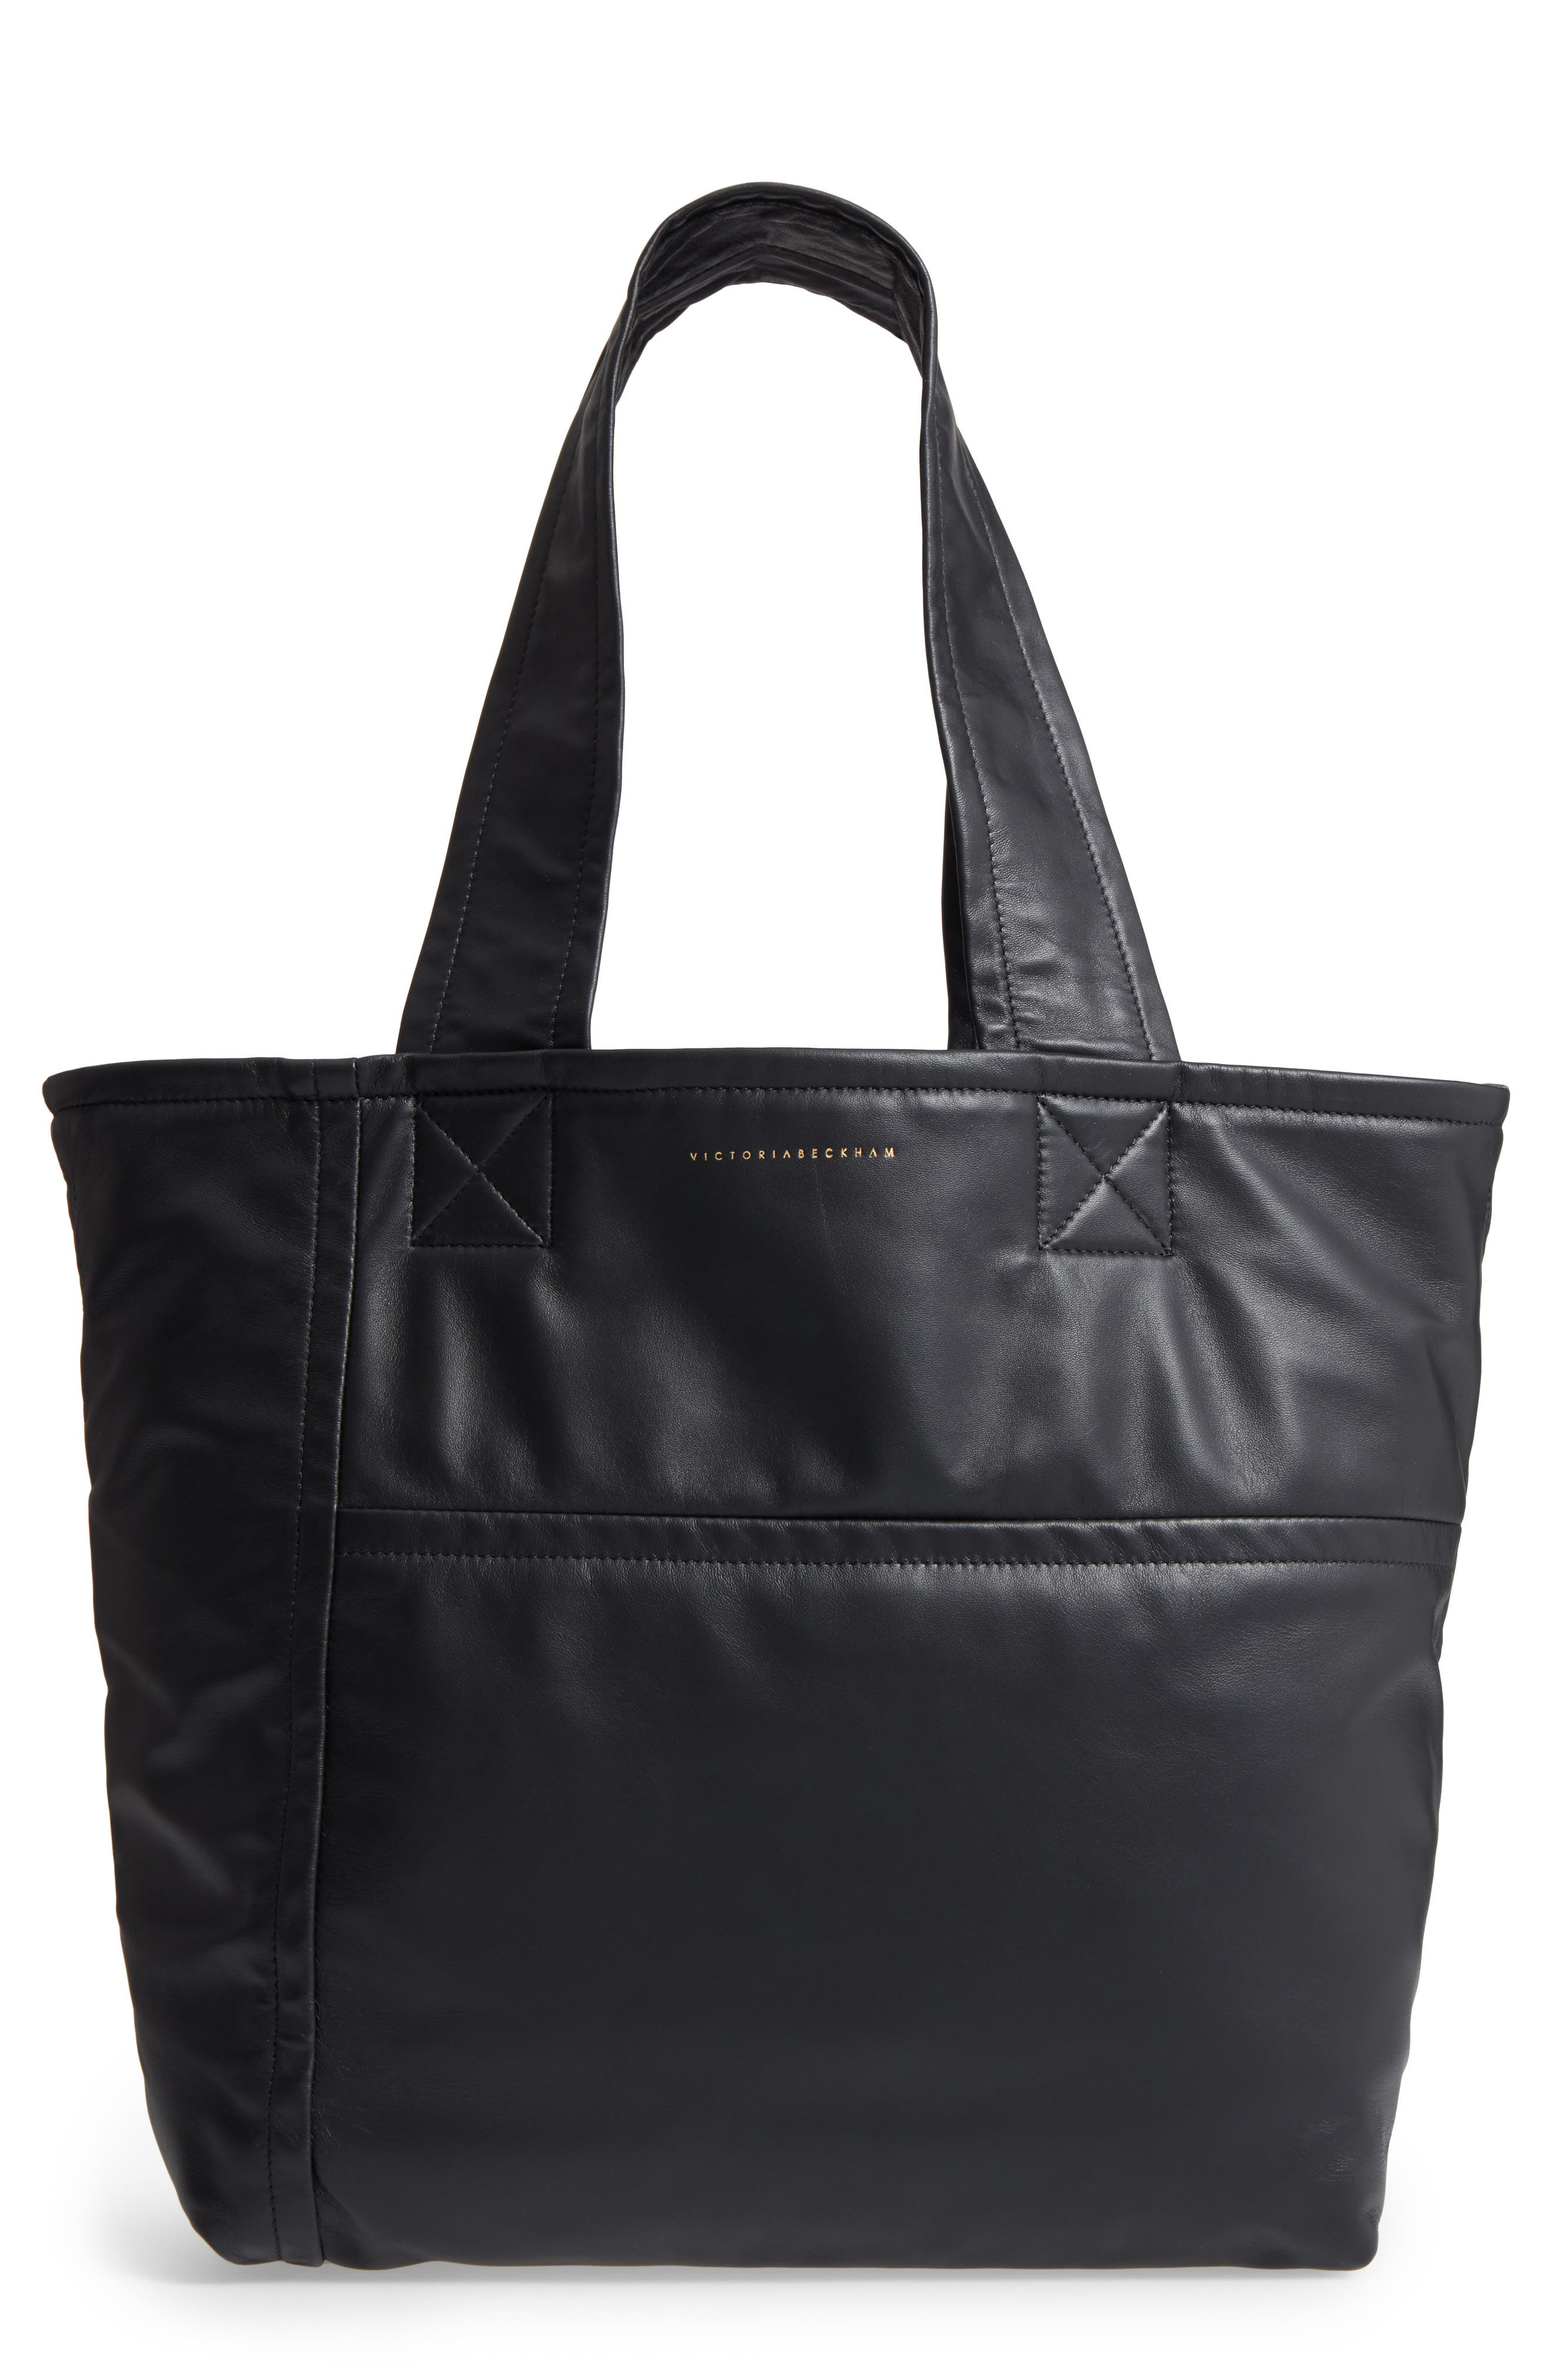 VICTORIA BECKHAM Mini Sunday Bag